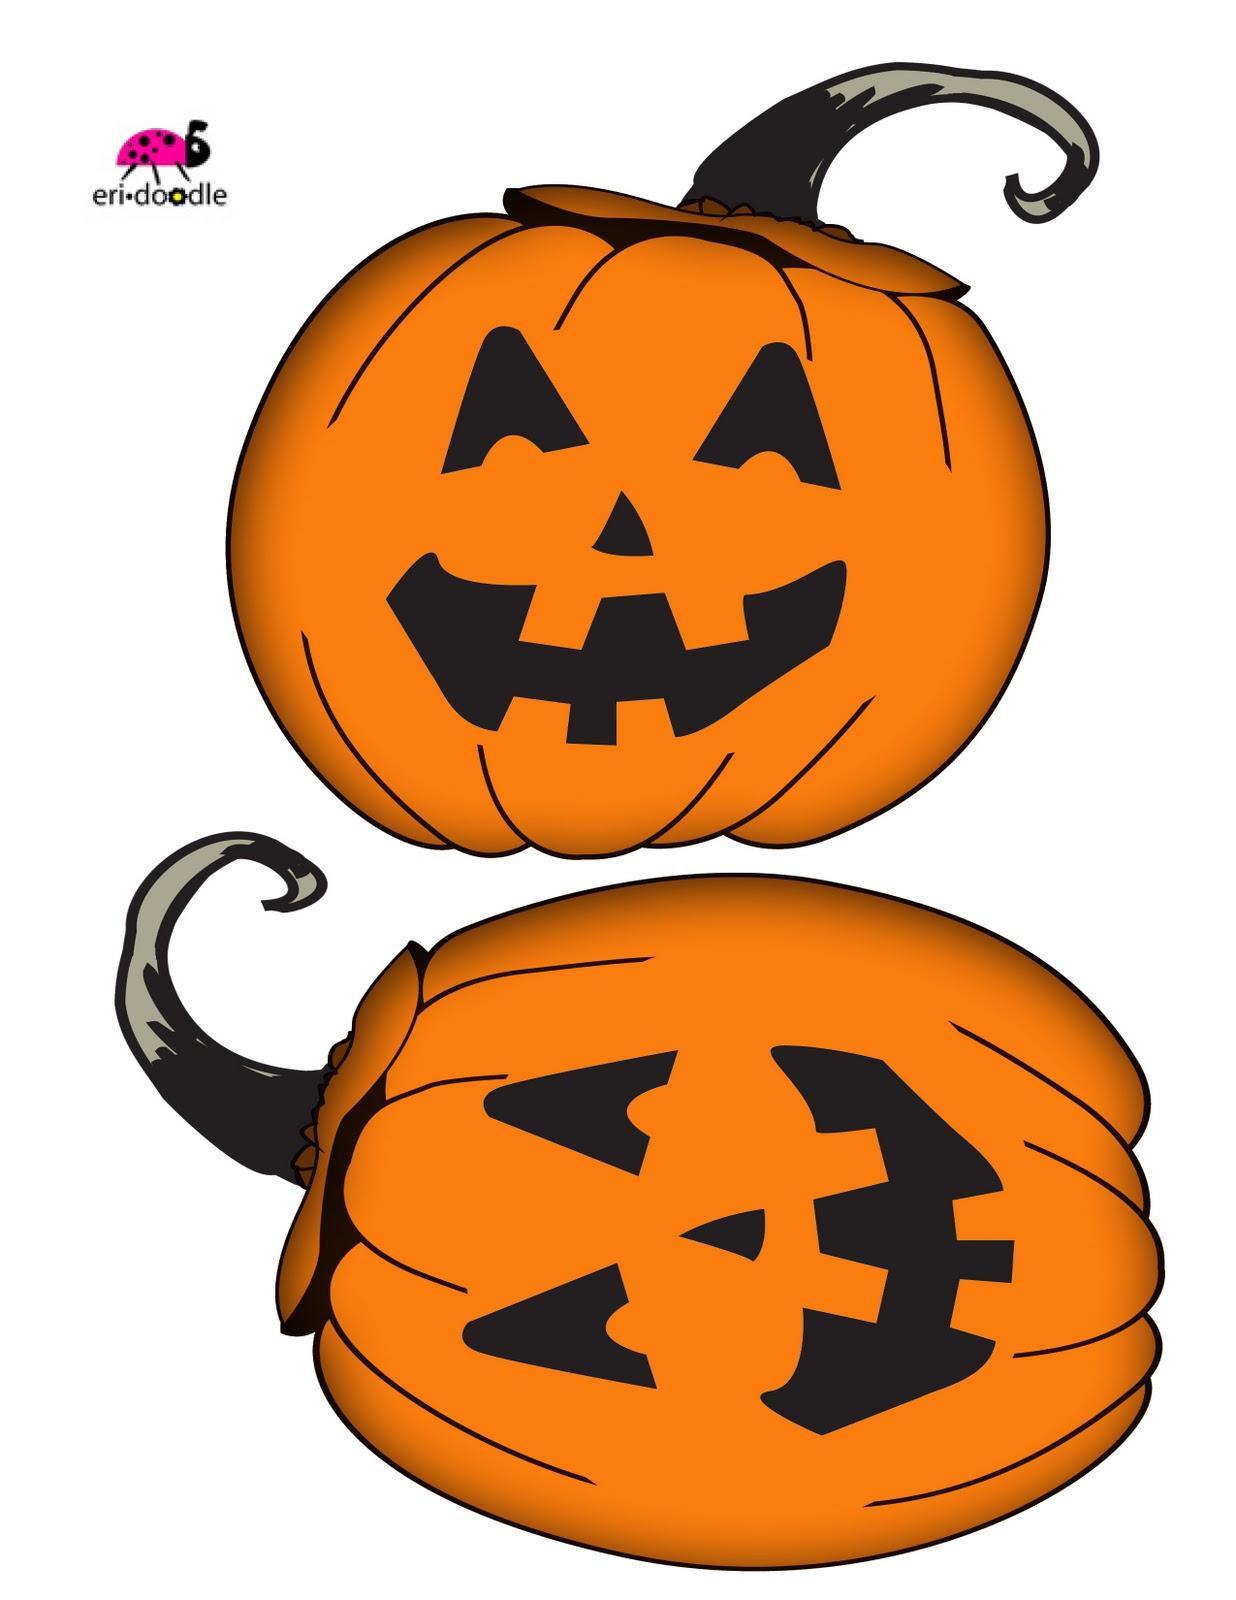 1236x1600 Eri Doodle Designs And Creations Simple Jack O Lantern Goodie Bag